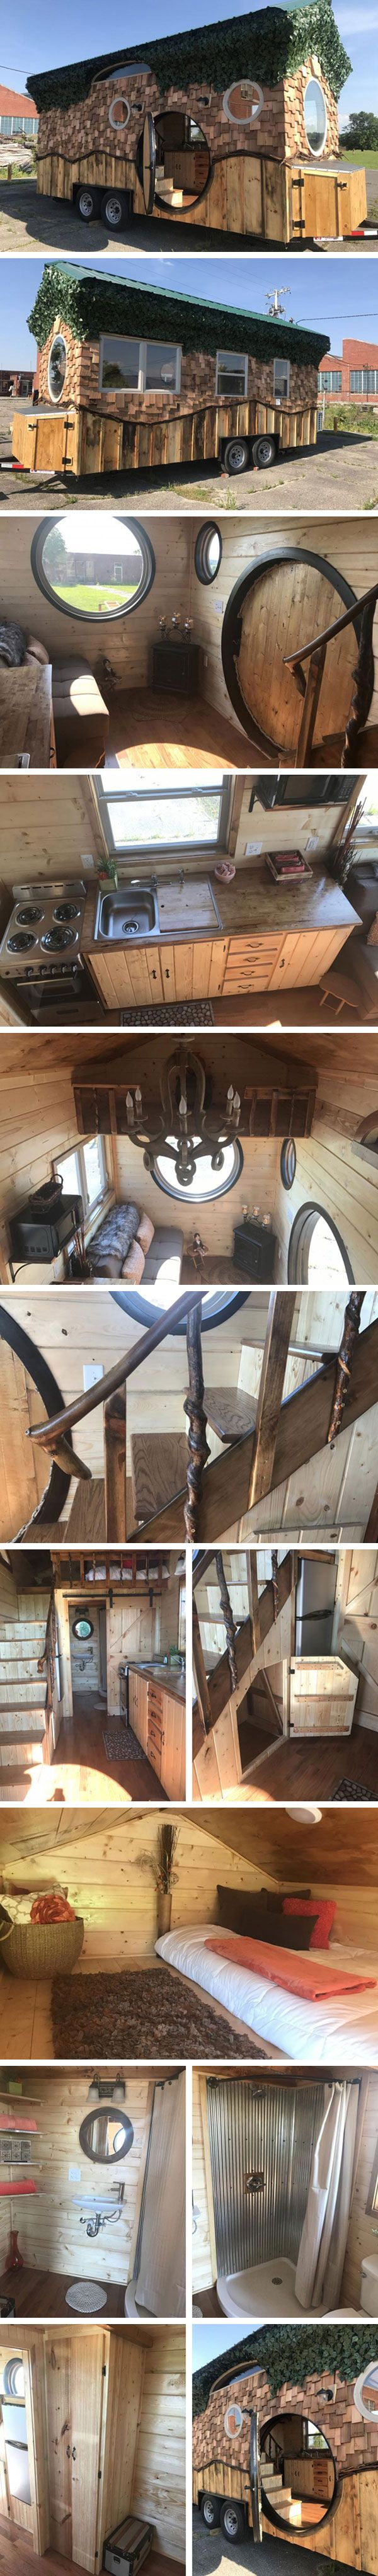 Дом на колесах Hobbit Hole от Incredible Tiny Homes #tinyhomesdigest #tinyhouse #houseonwheels #camper